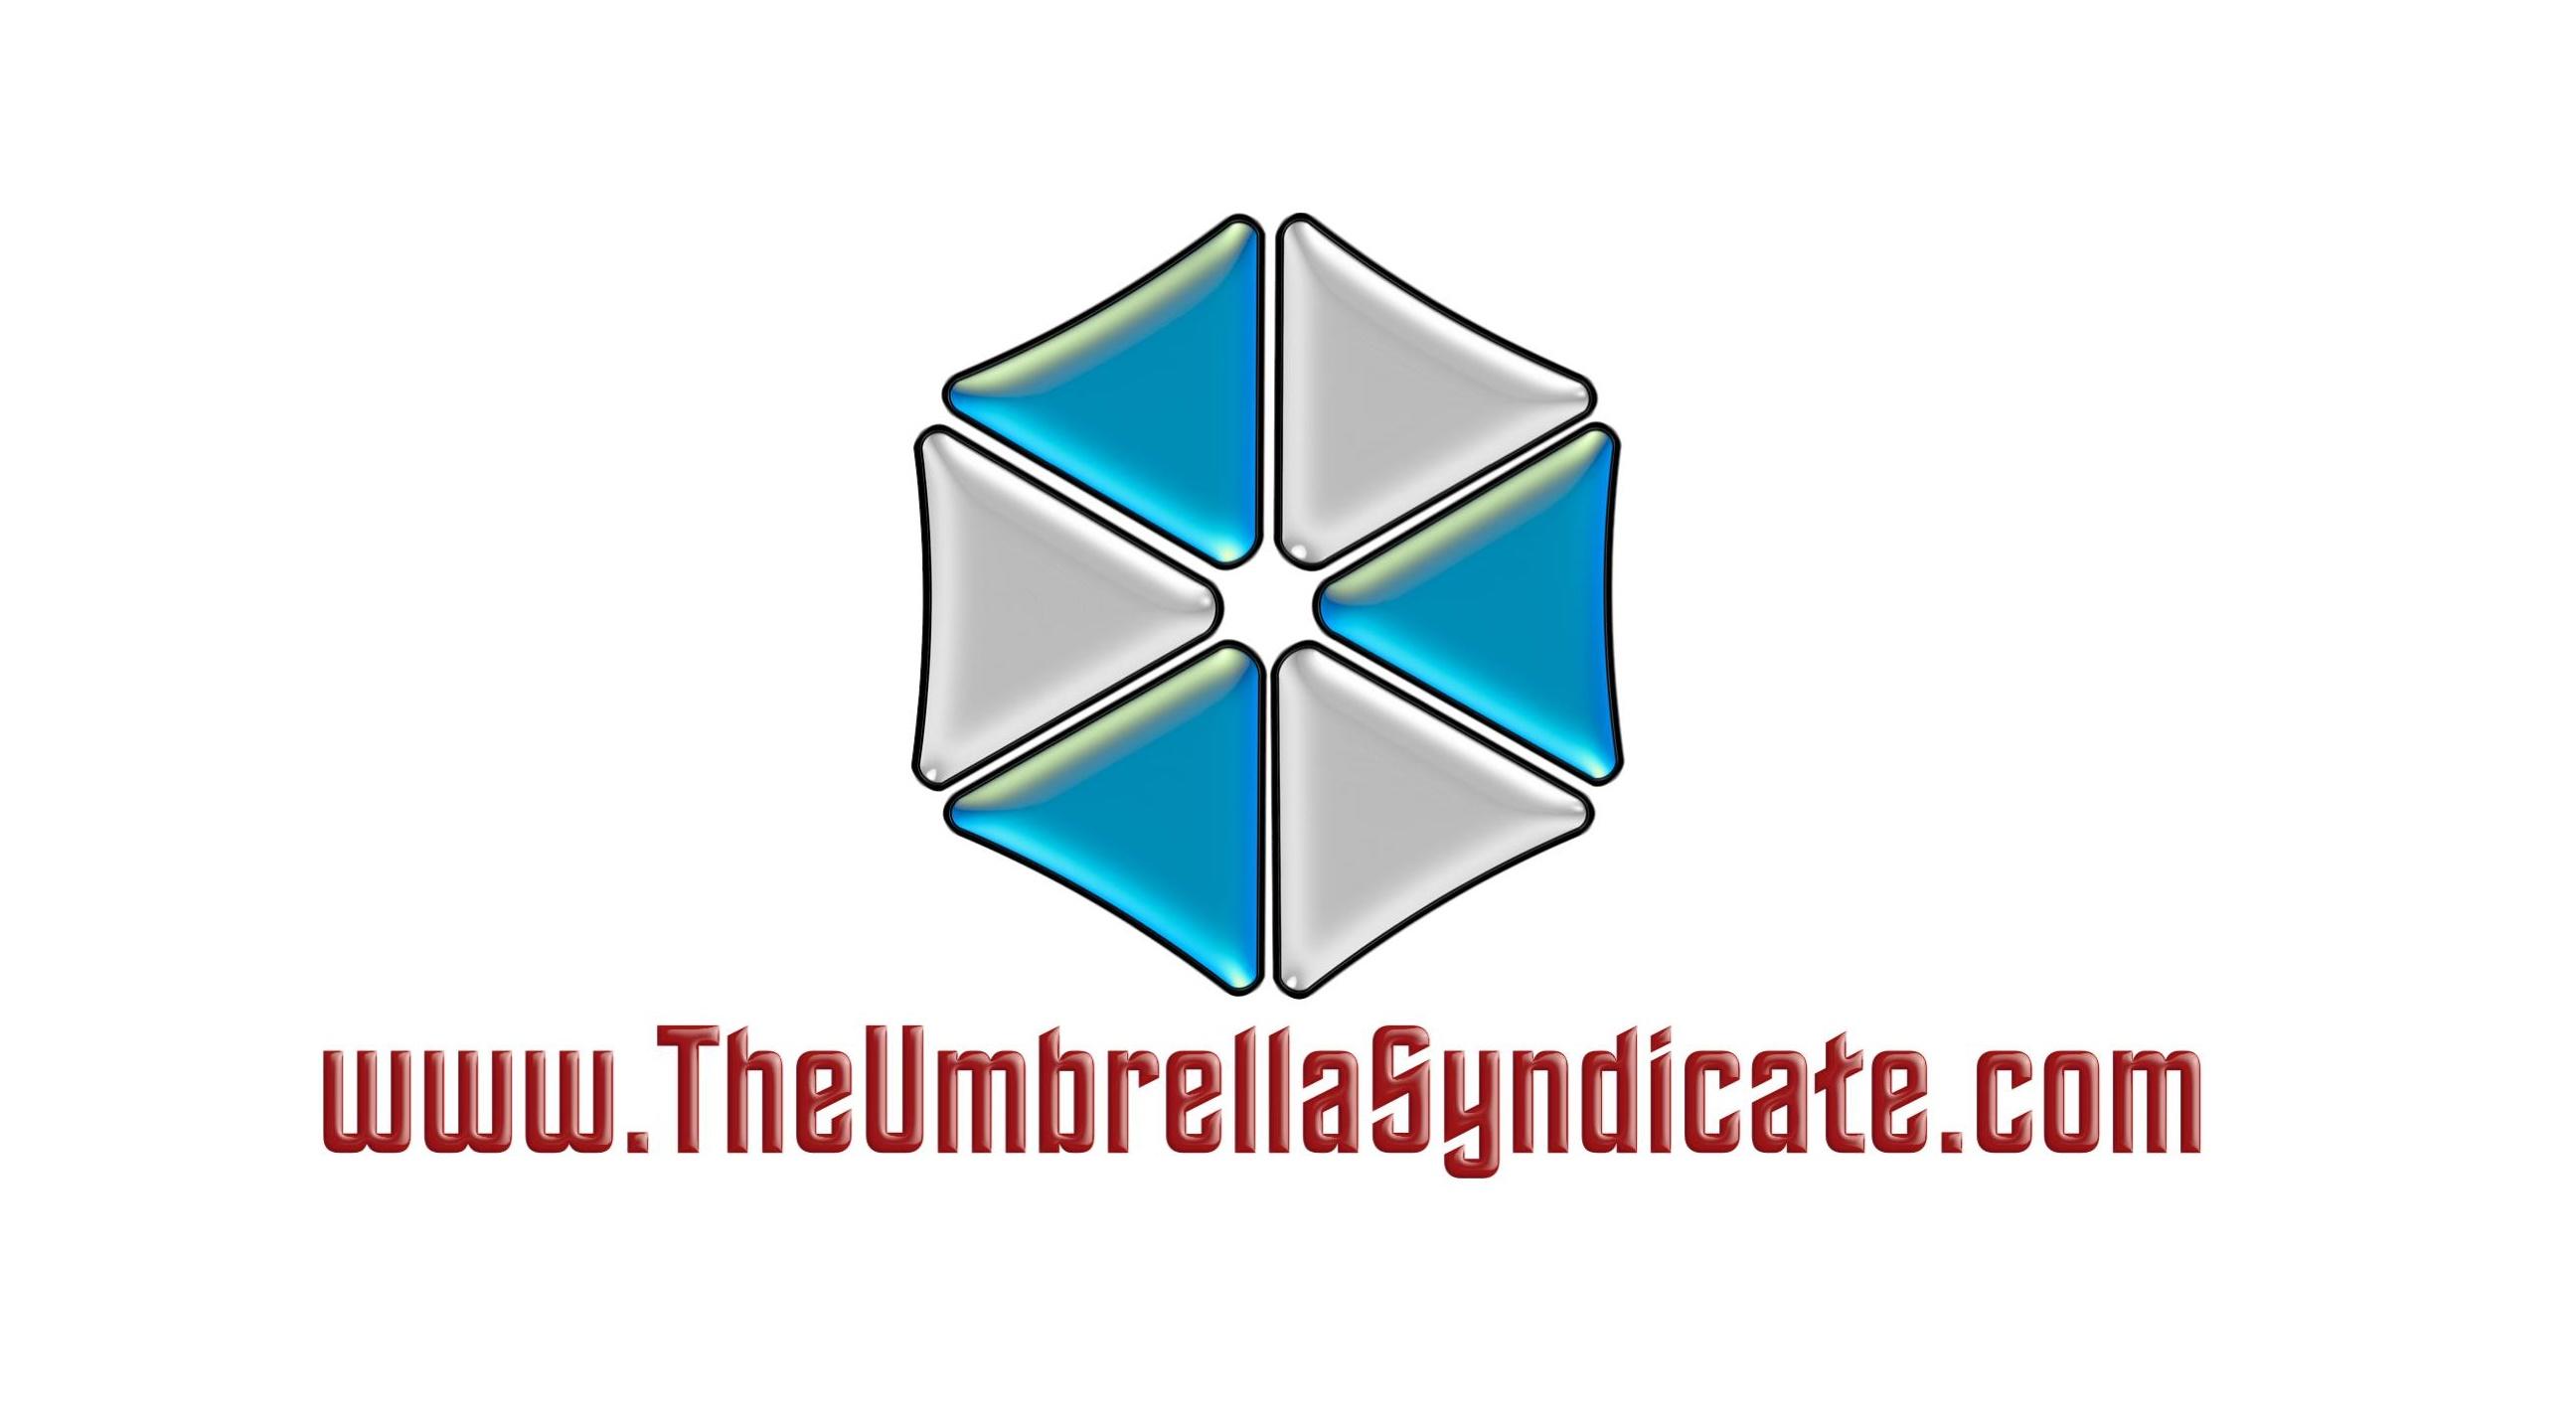 Umbrella Syndicate